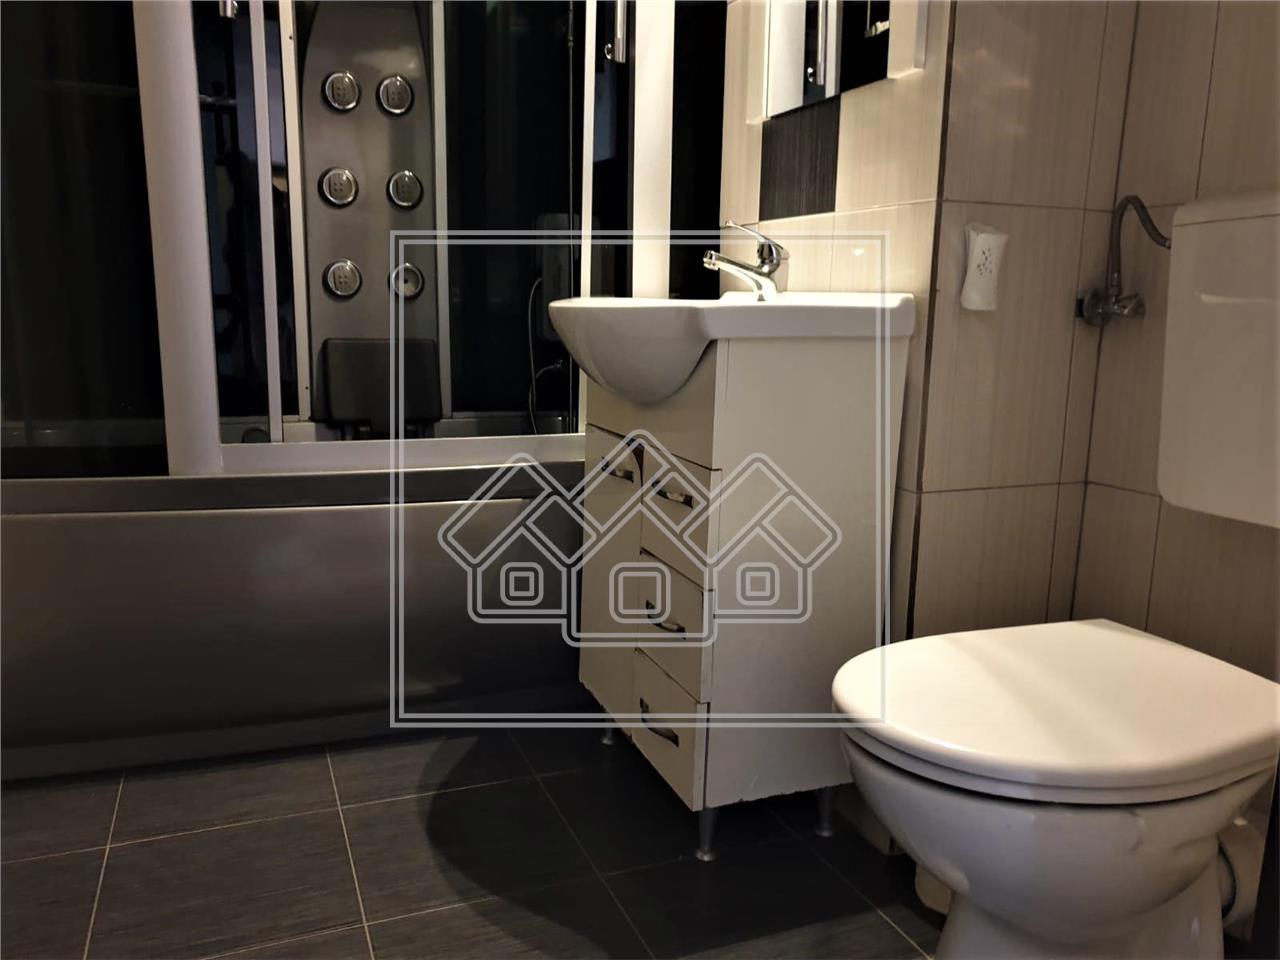 Apartament de vanzare in Sibiu-3 camere si 2 balcoane-Zona Valea Aurie